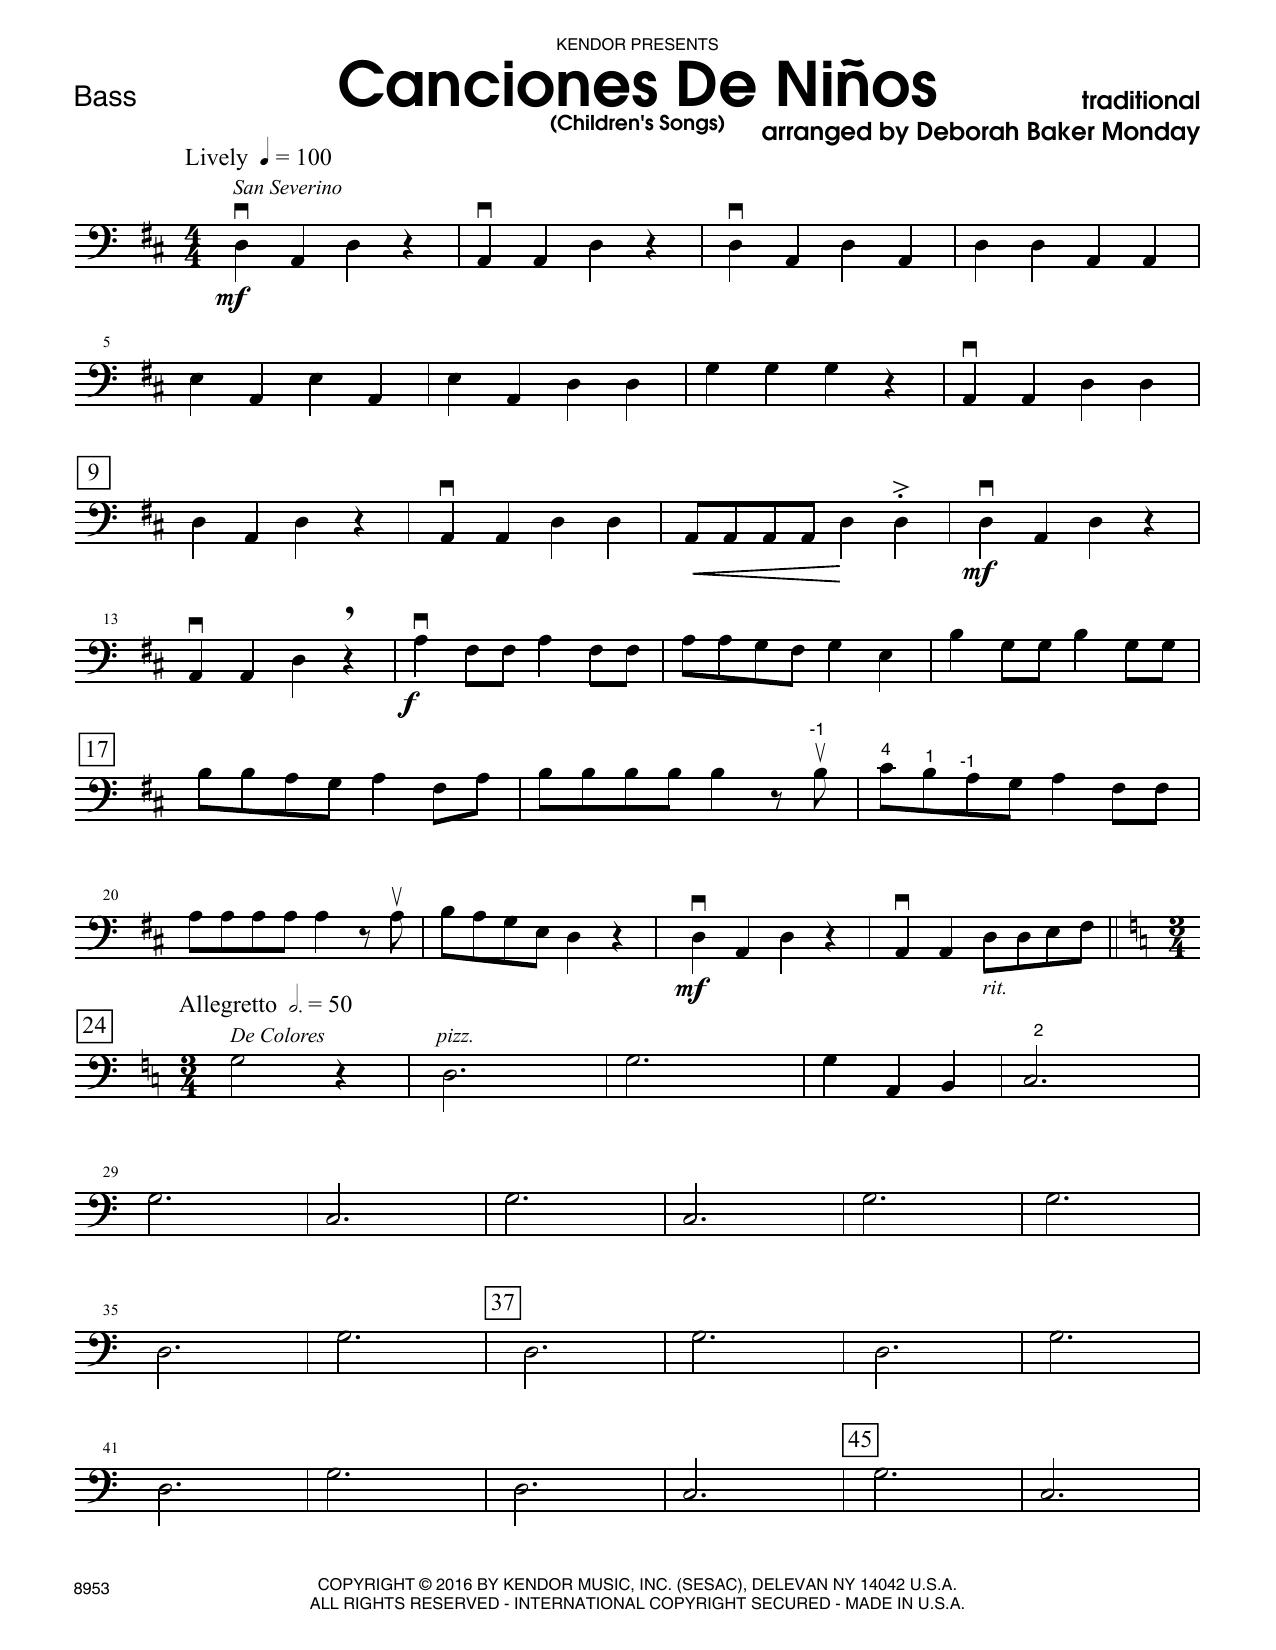 Deborah Baker Monday Canciones De Ninos - Bass sheet music notes and chords. Download Printable PDF.